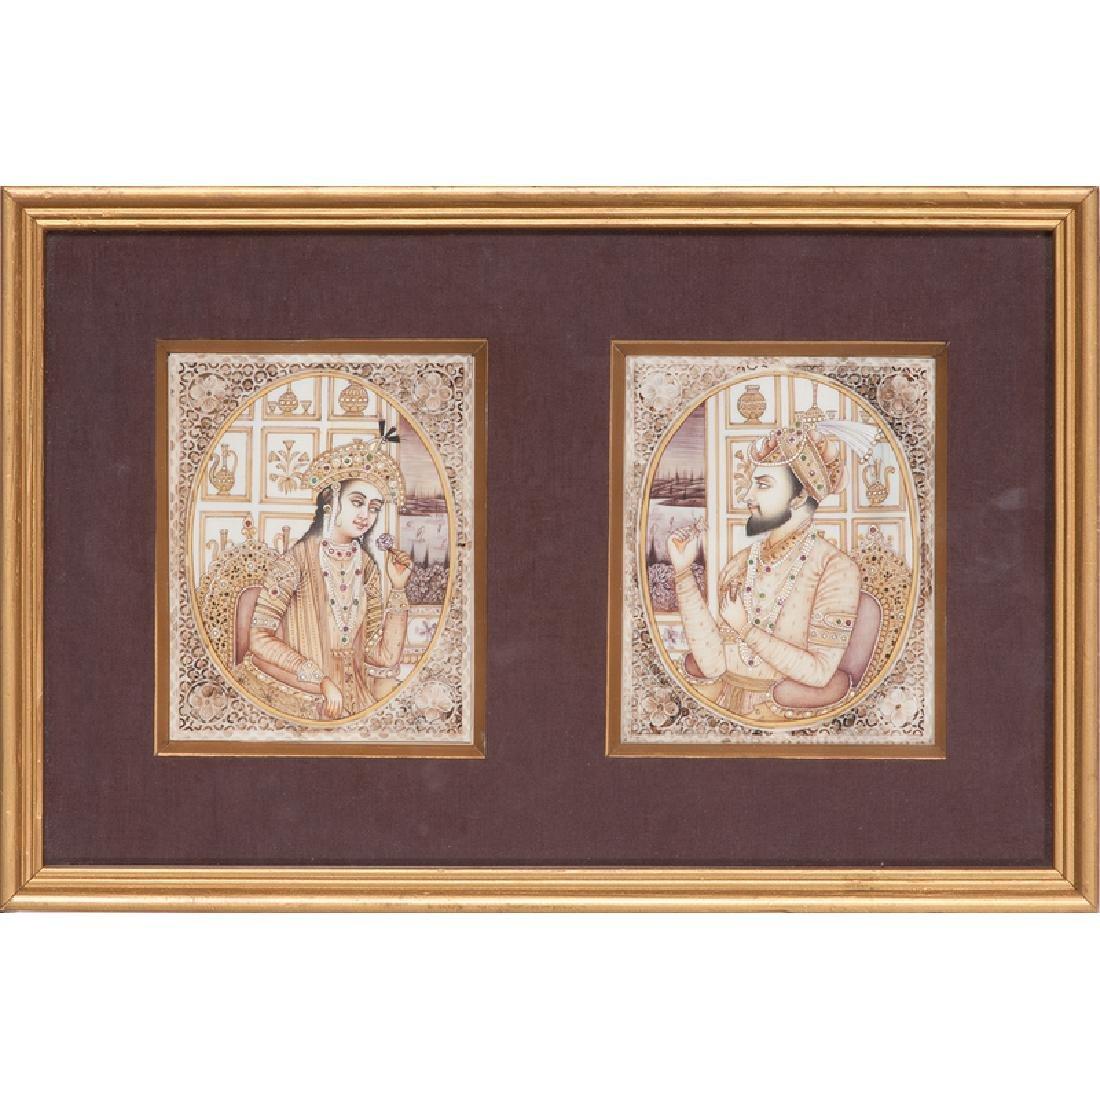 Indian School Portraits of Shah Jahan and Mumtaz Mahal - 2